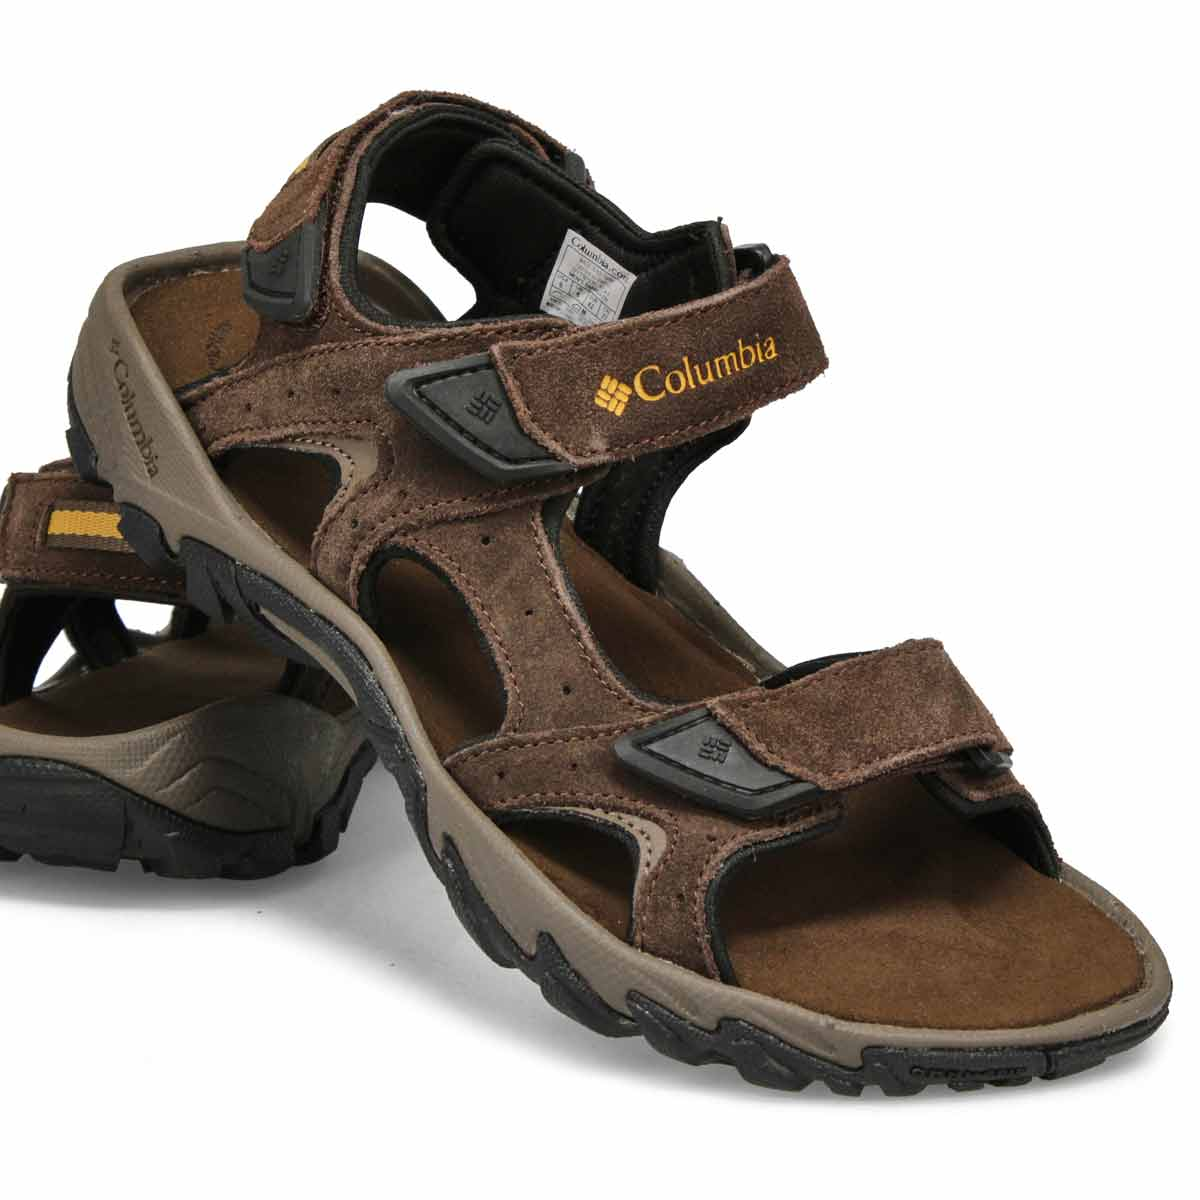 Sandales 3brides SANTIAM, brun/banane, hommes